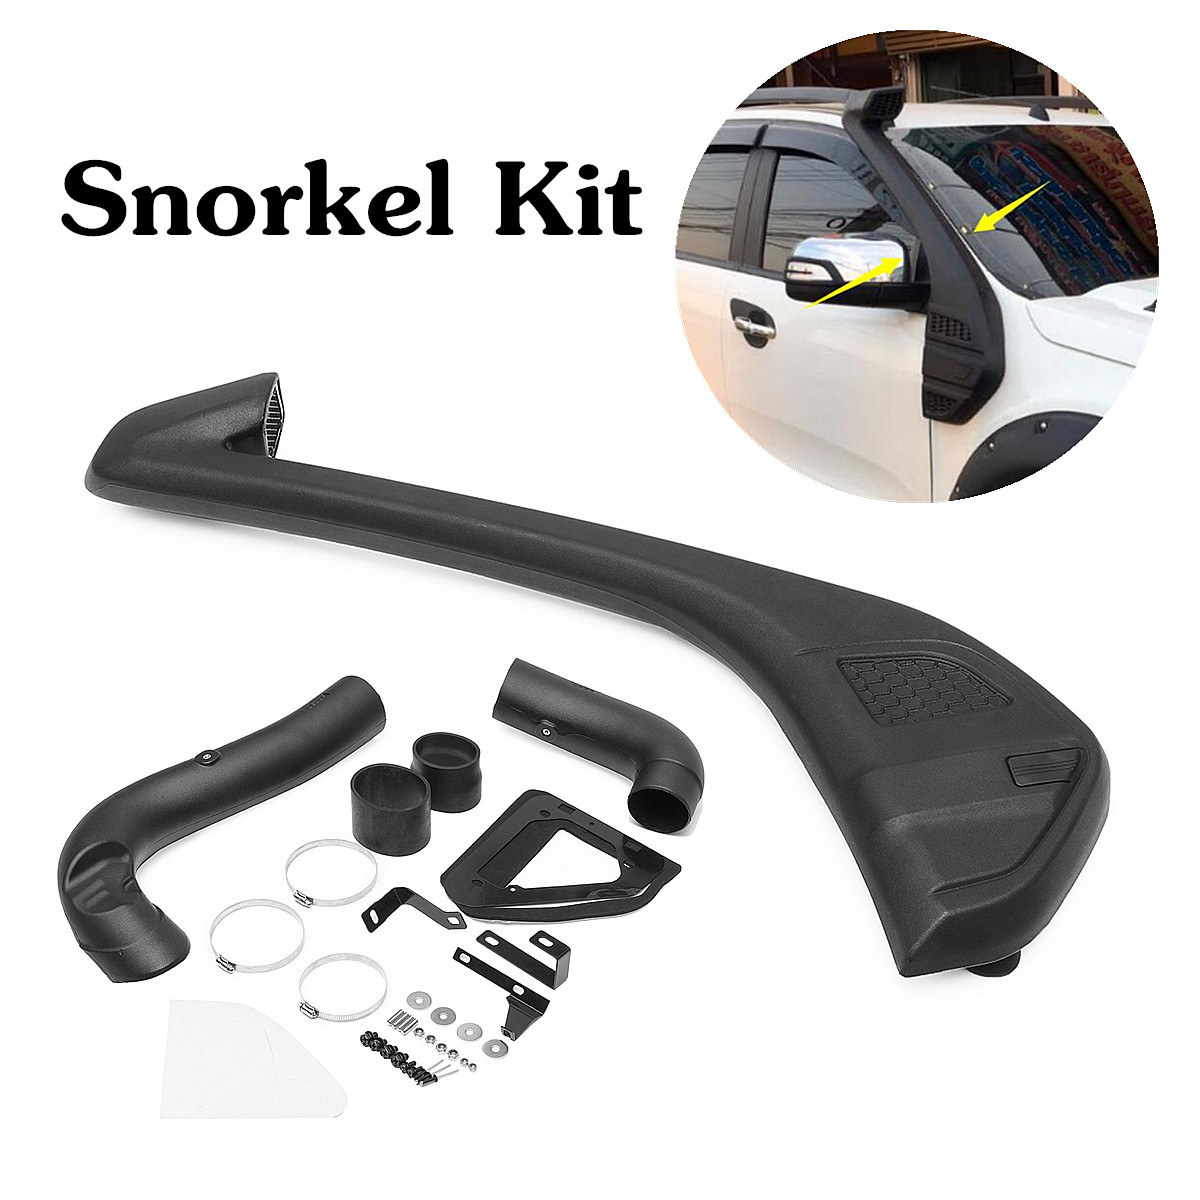 Air Raise Intake Snorkel Petrol Diesel-Kit Set For 2013 Ford-Ranger T6 Wildtrak 110x30cm Polyethylene Black UV Resistant Linear